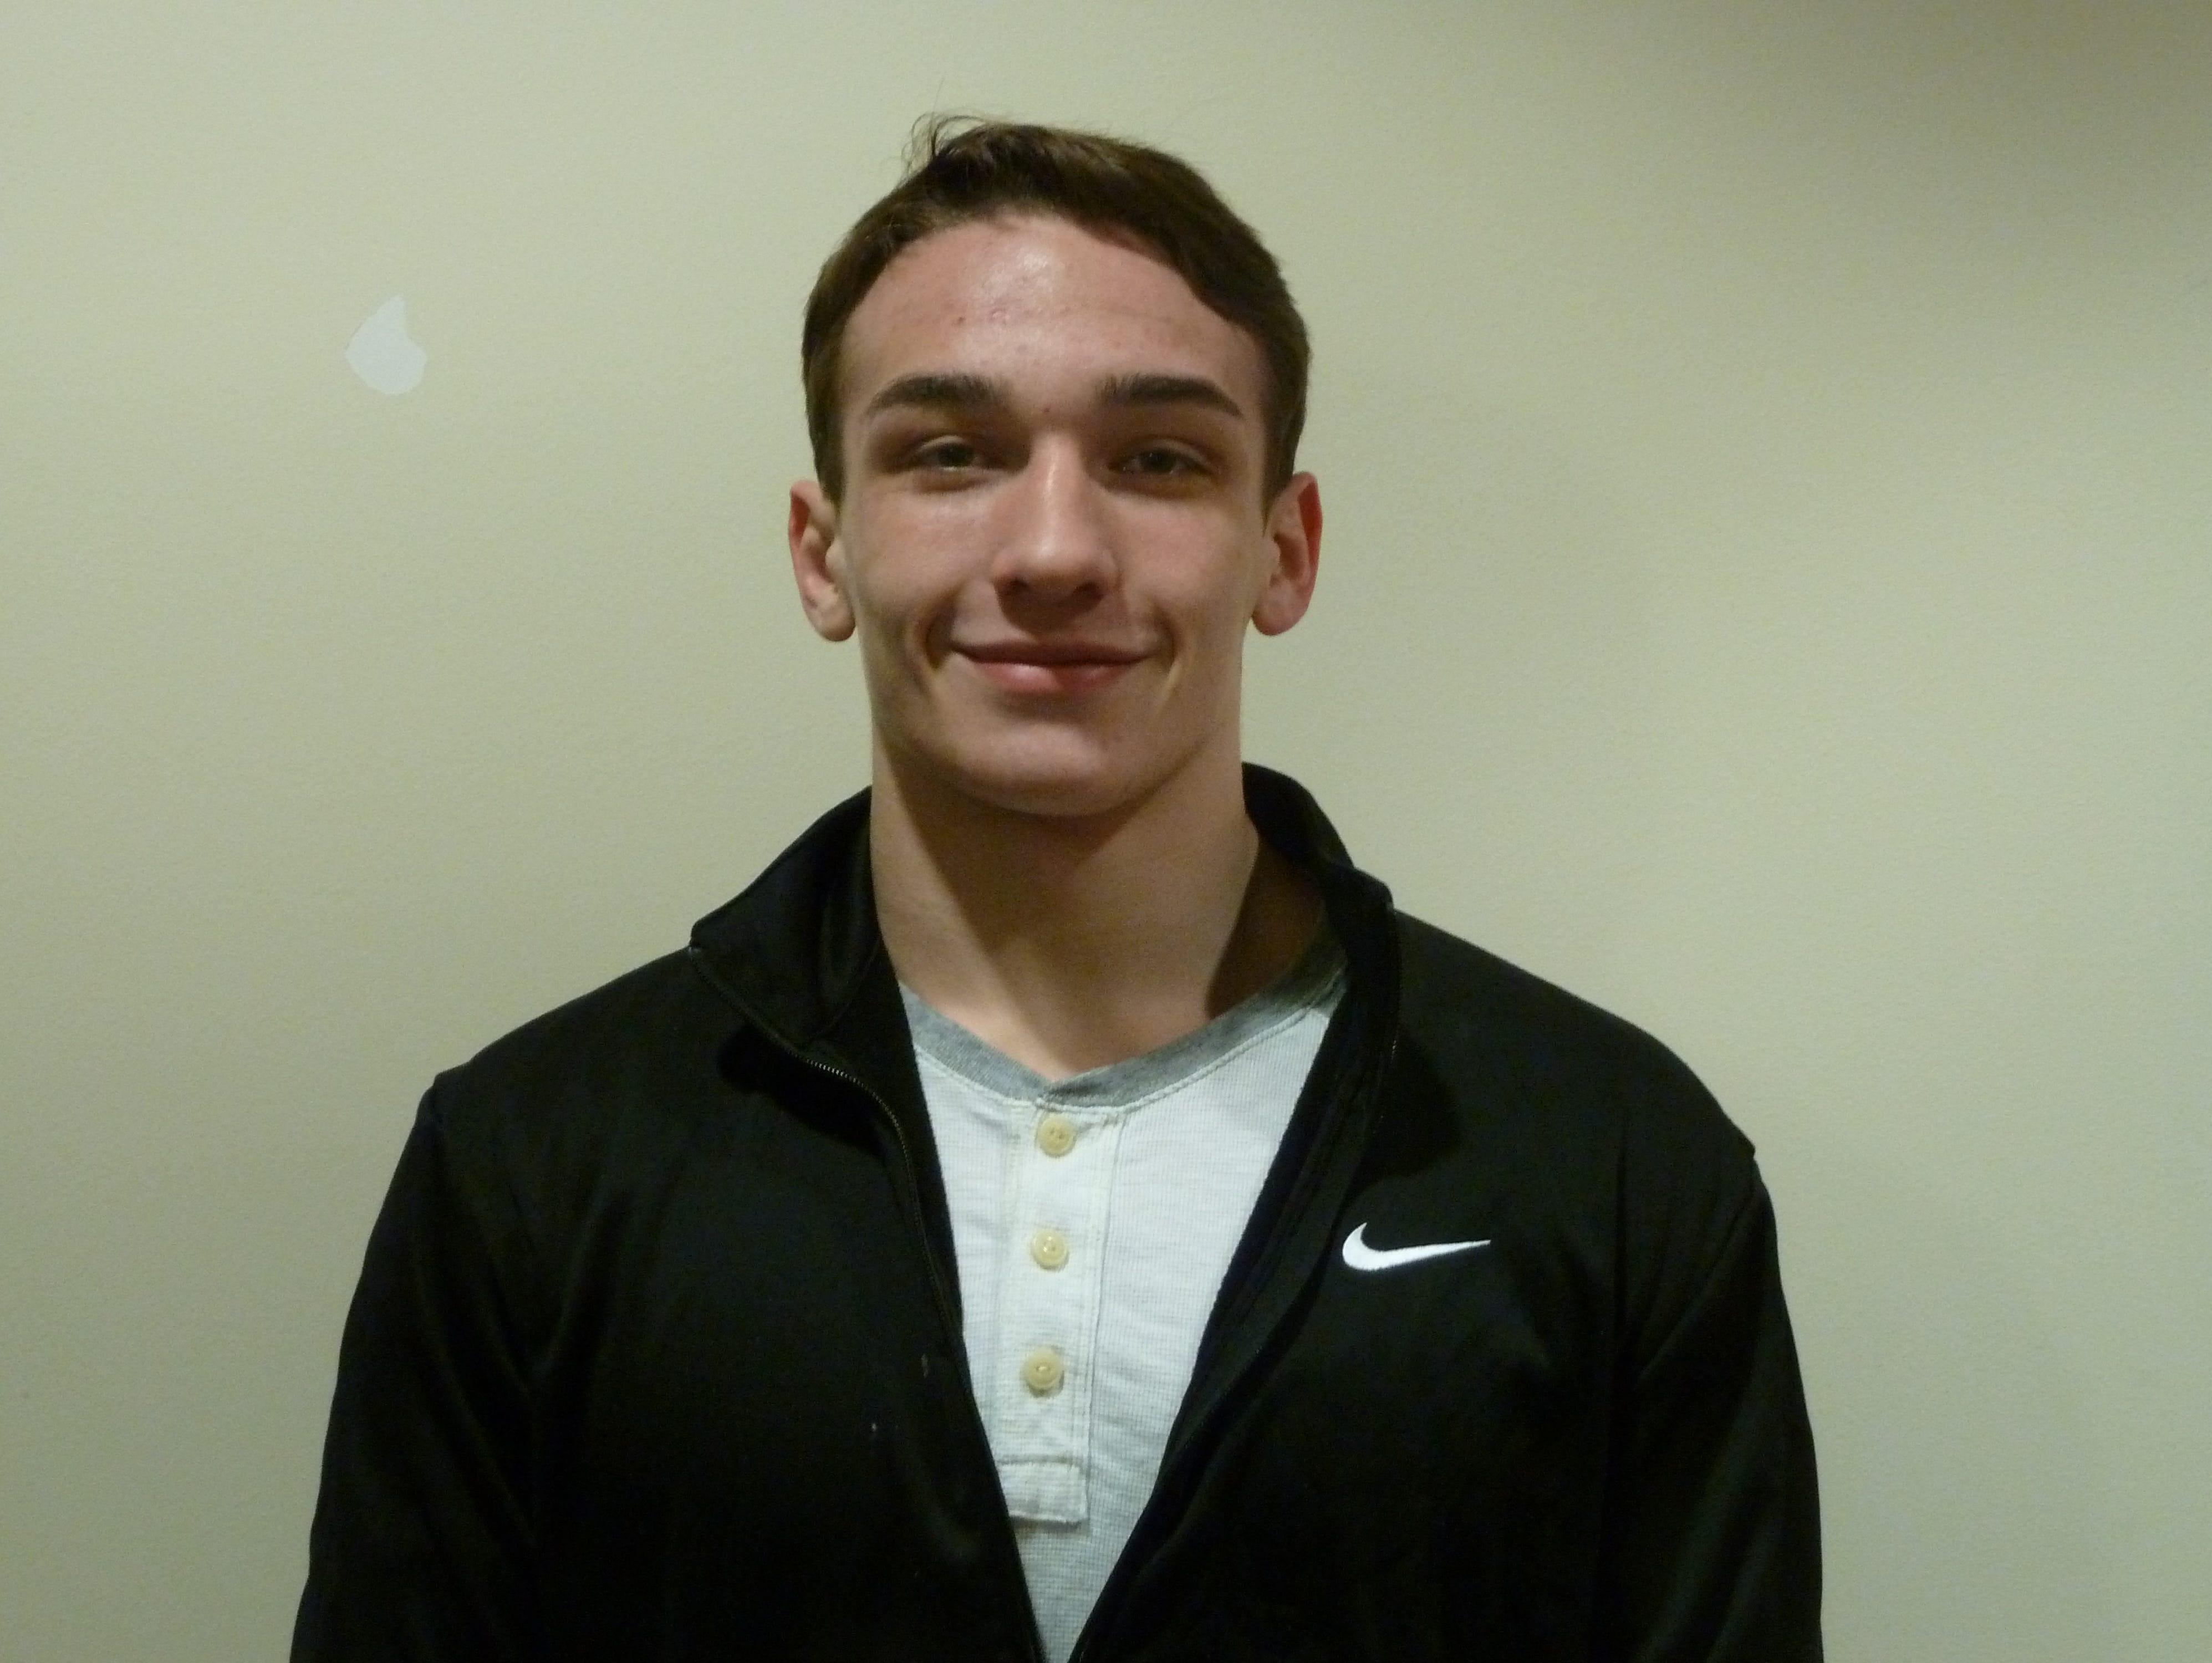 McKay senior Matthew Jarding